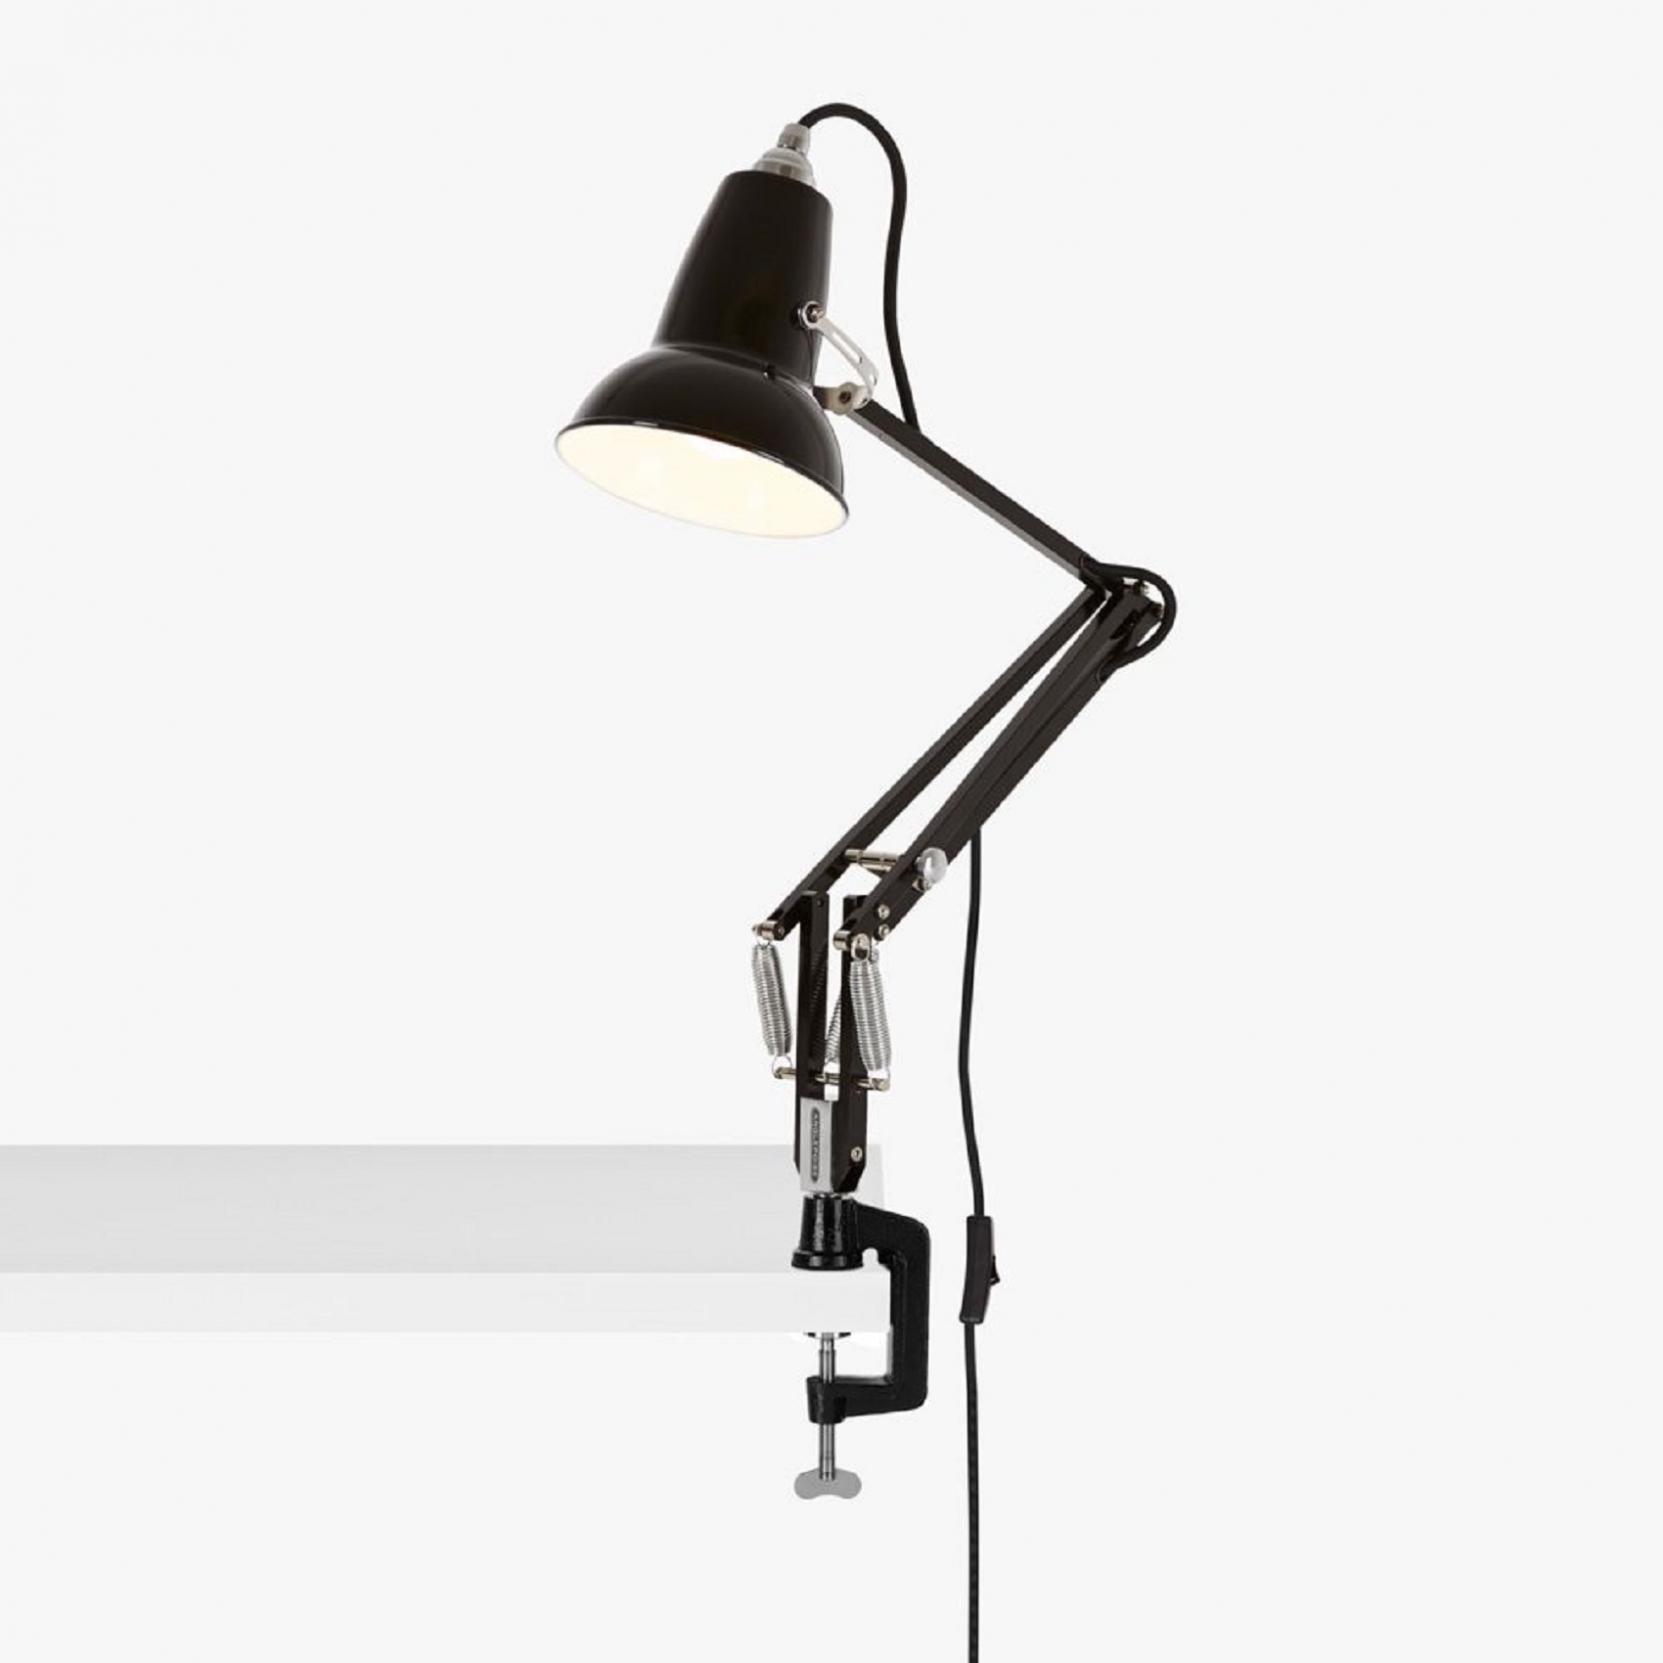 ANGLEPOISE ORIGINAL 1227 MINI LAMP WITH DESK CLAMP - TattaHome